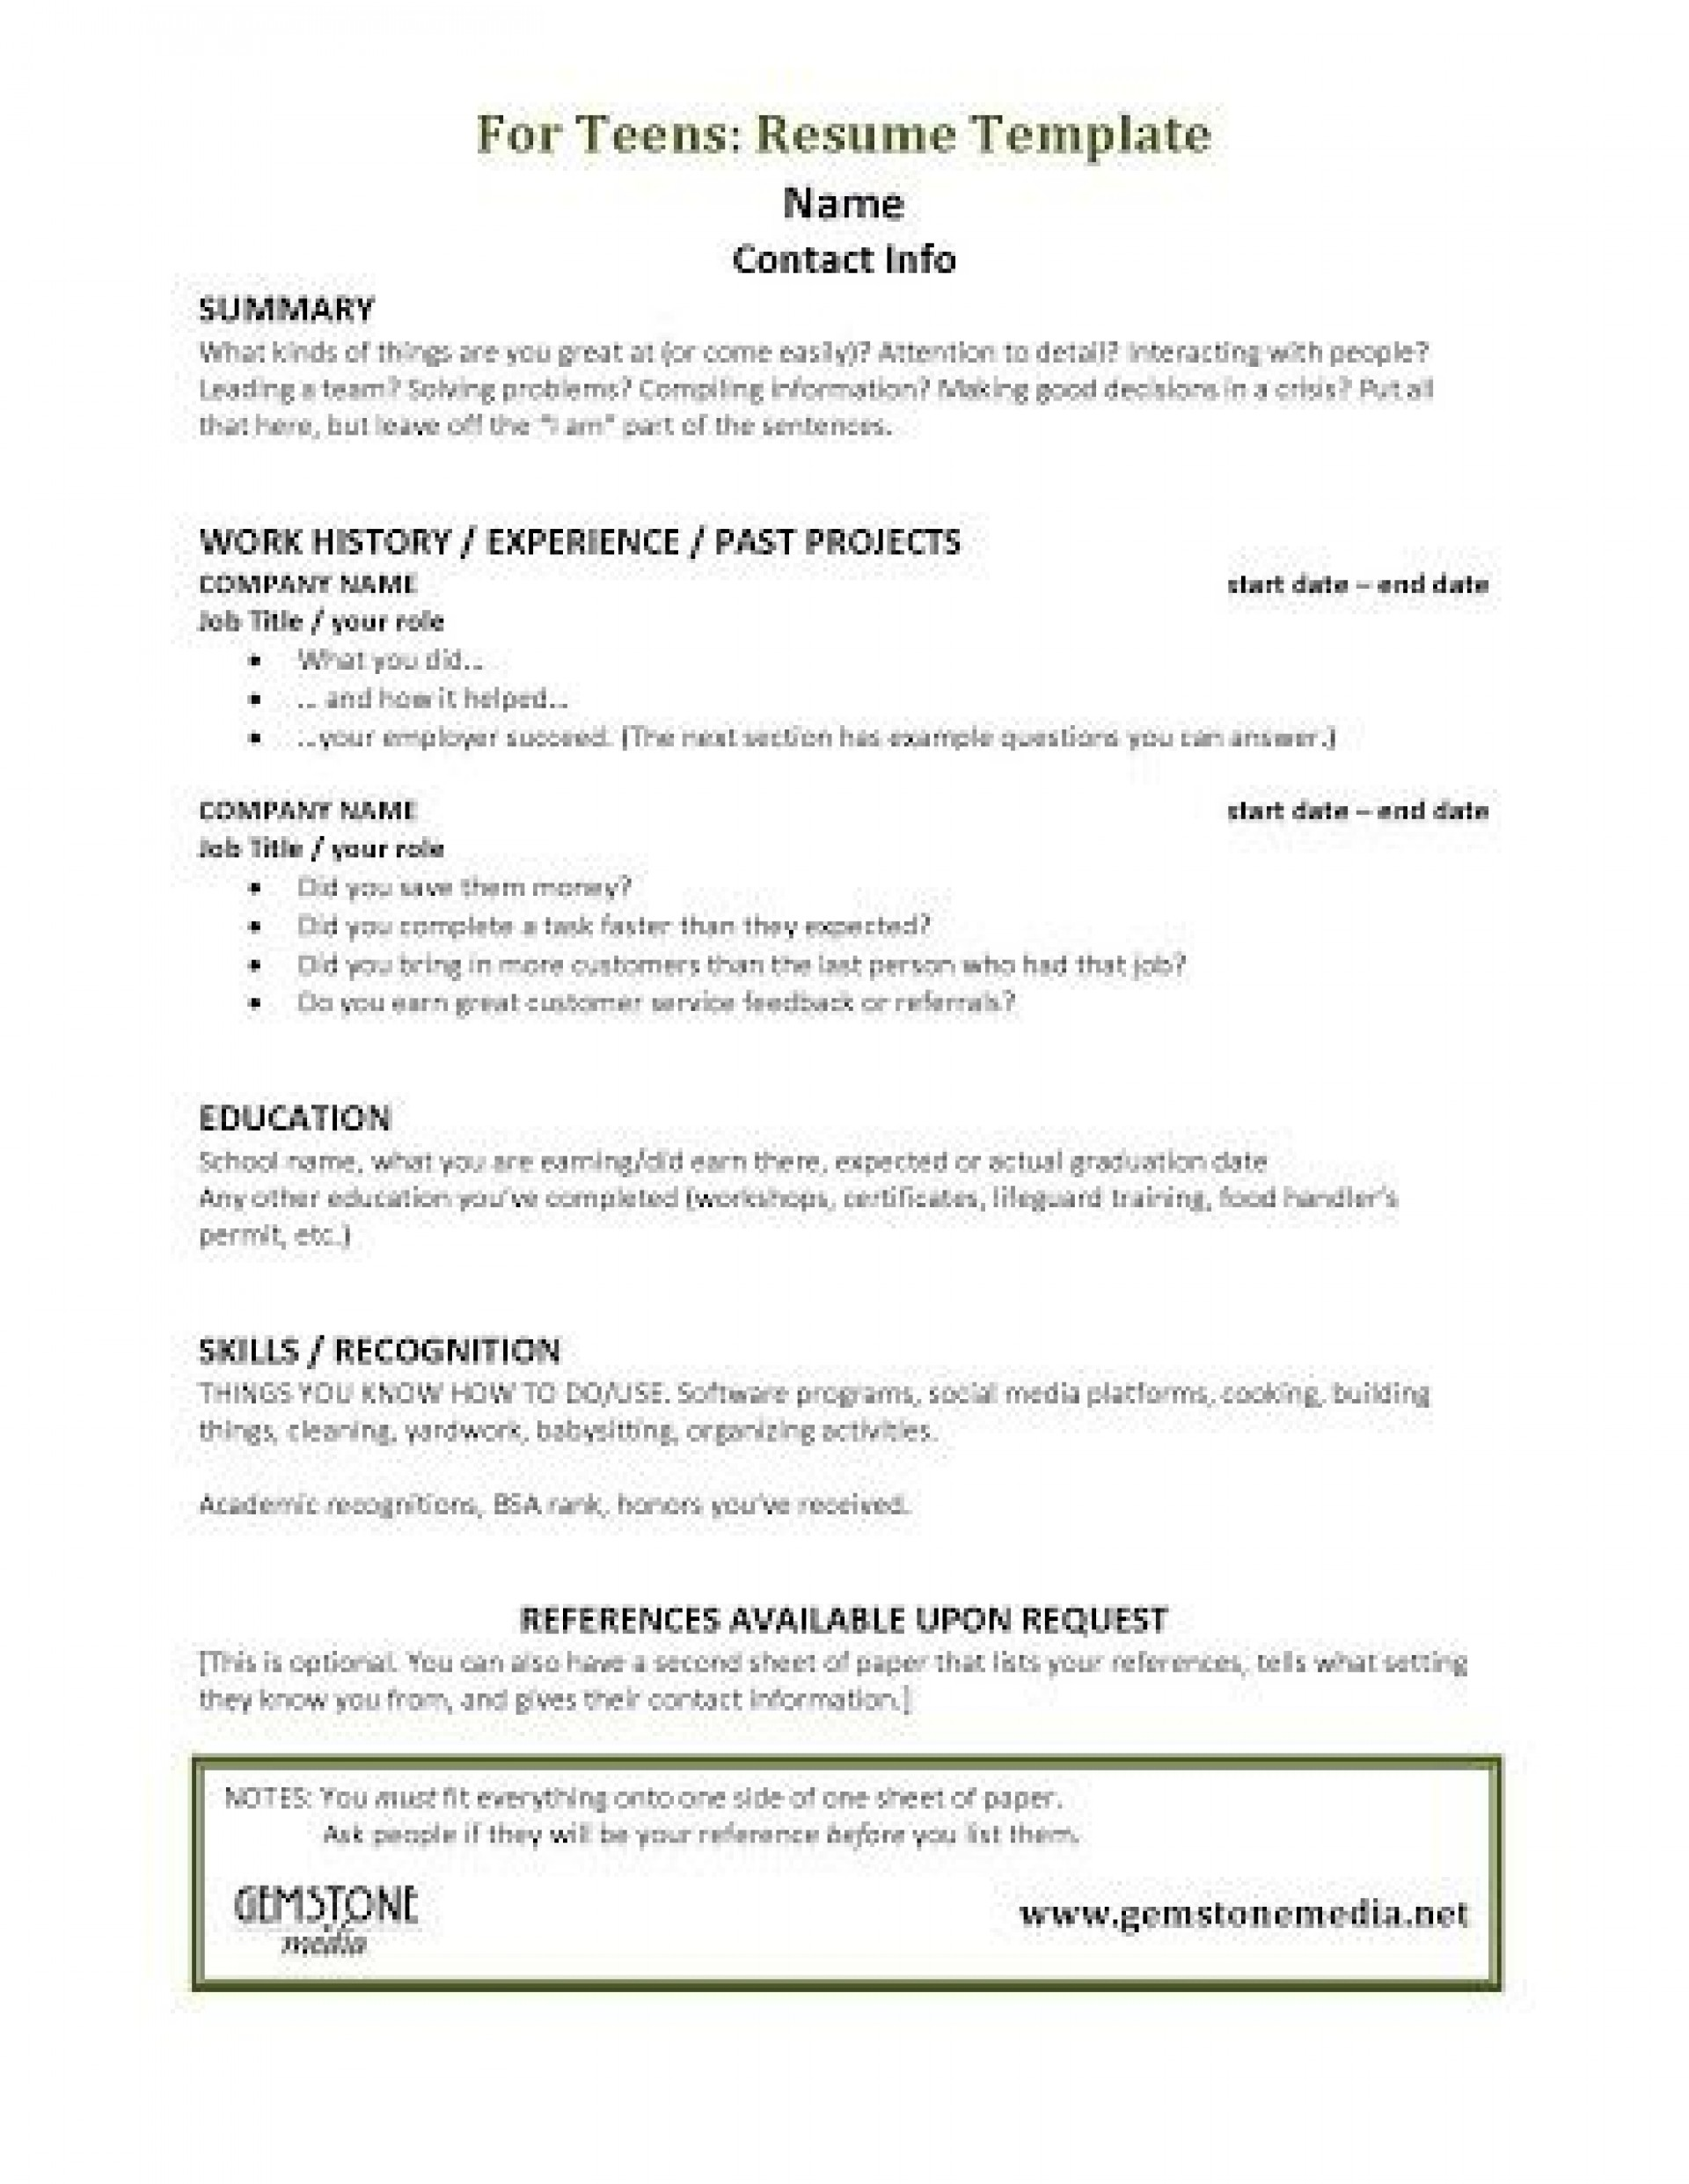 001 Astounding Resume Template For Teen Design  Teenager First Job Australia1920